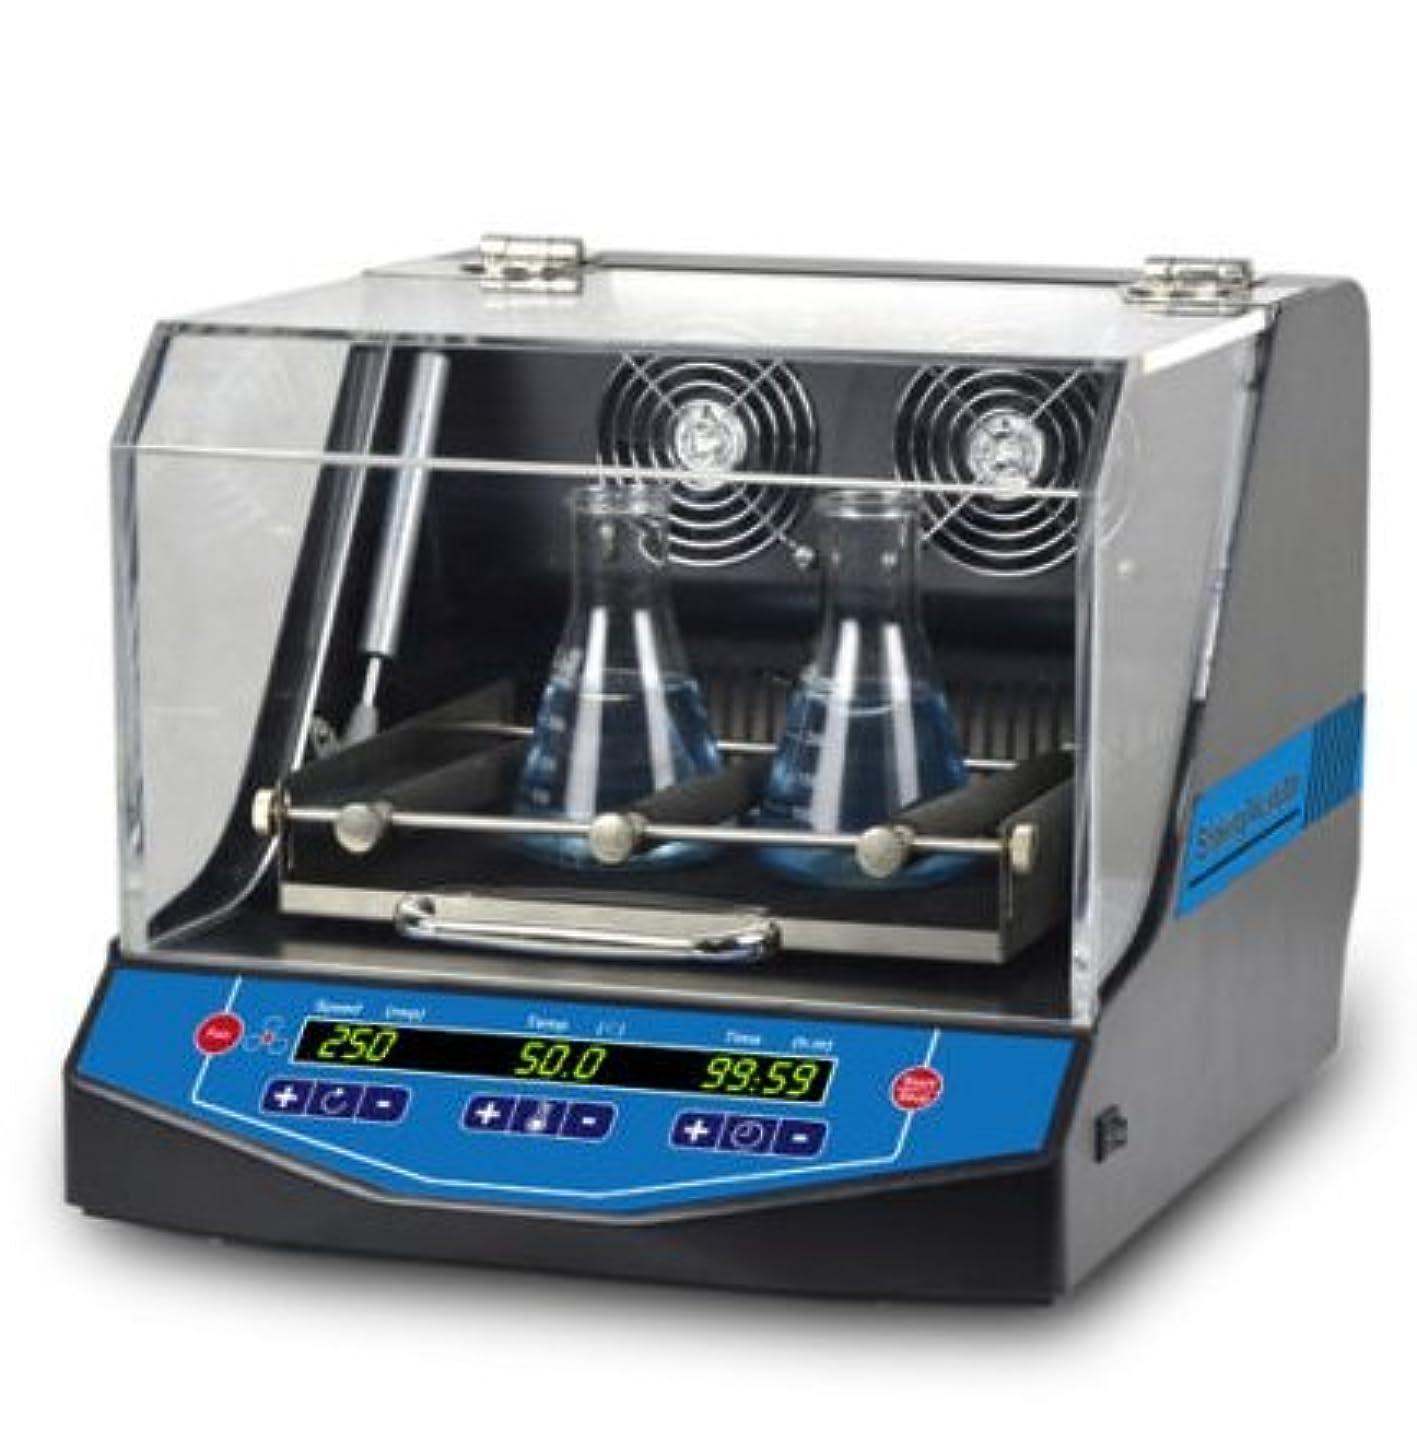 Lab Thermostatic Temperature Controlled Incubator Shaker